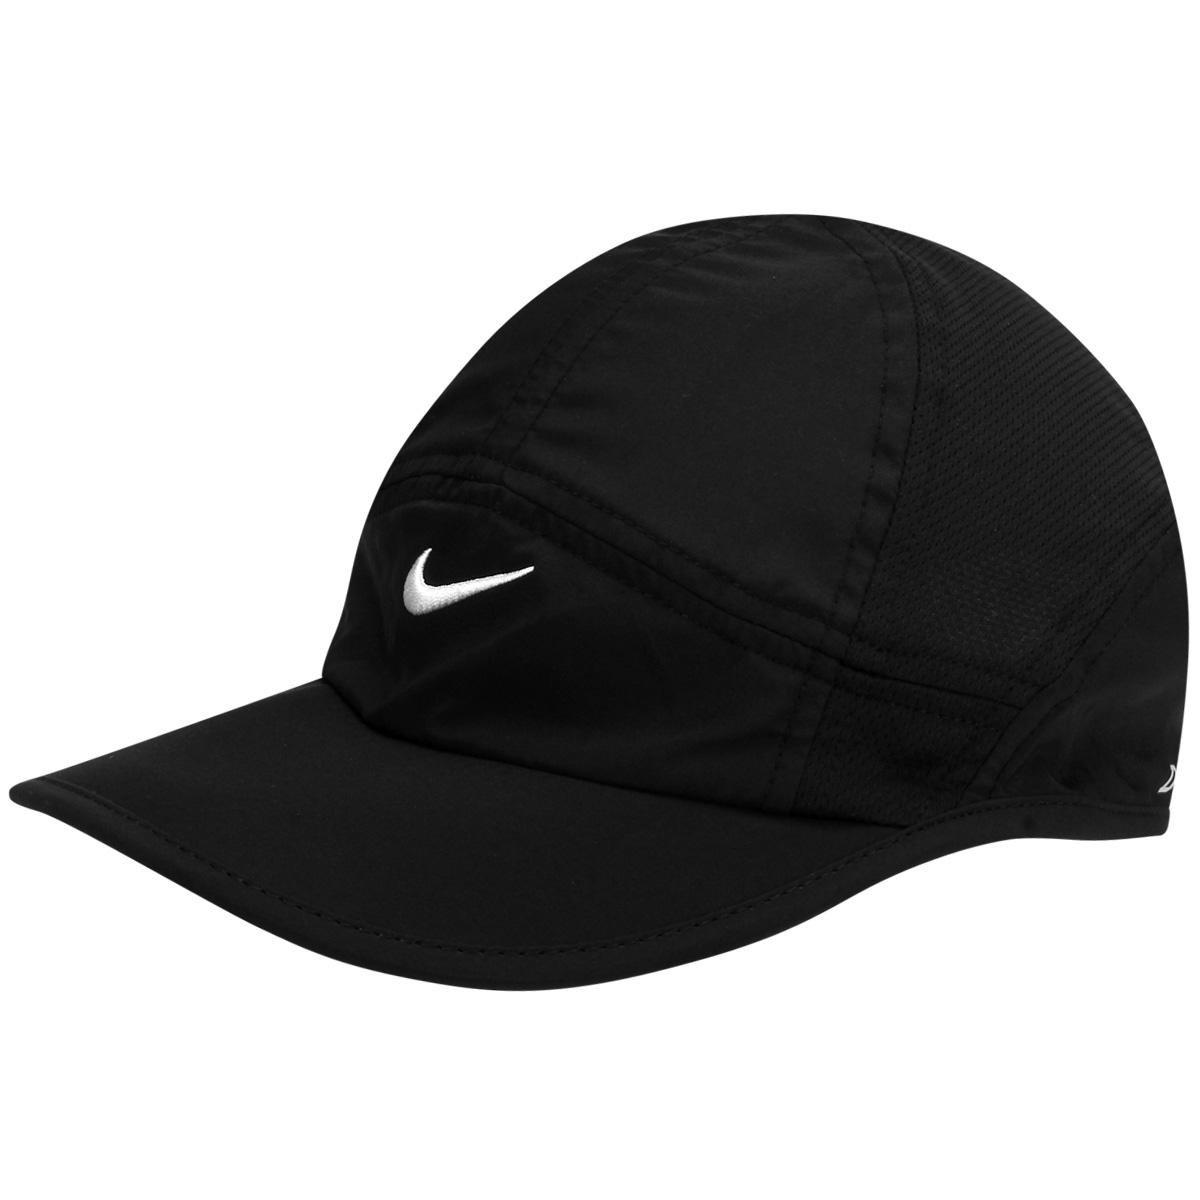 Boné Nike Featherlight 2.0 - Compre Agora  4003c5935c9